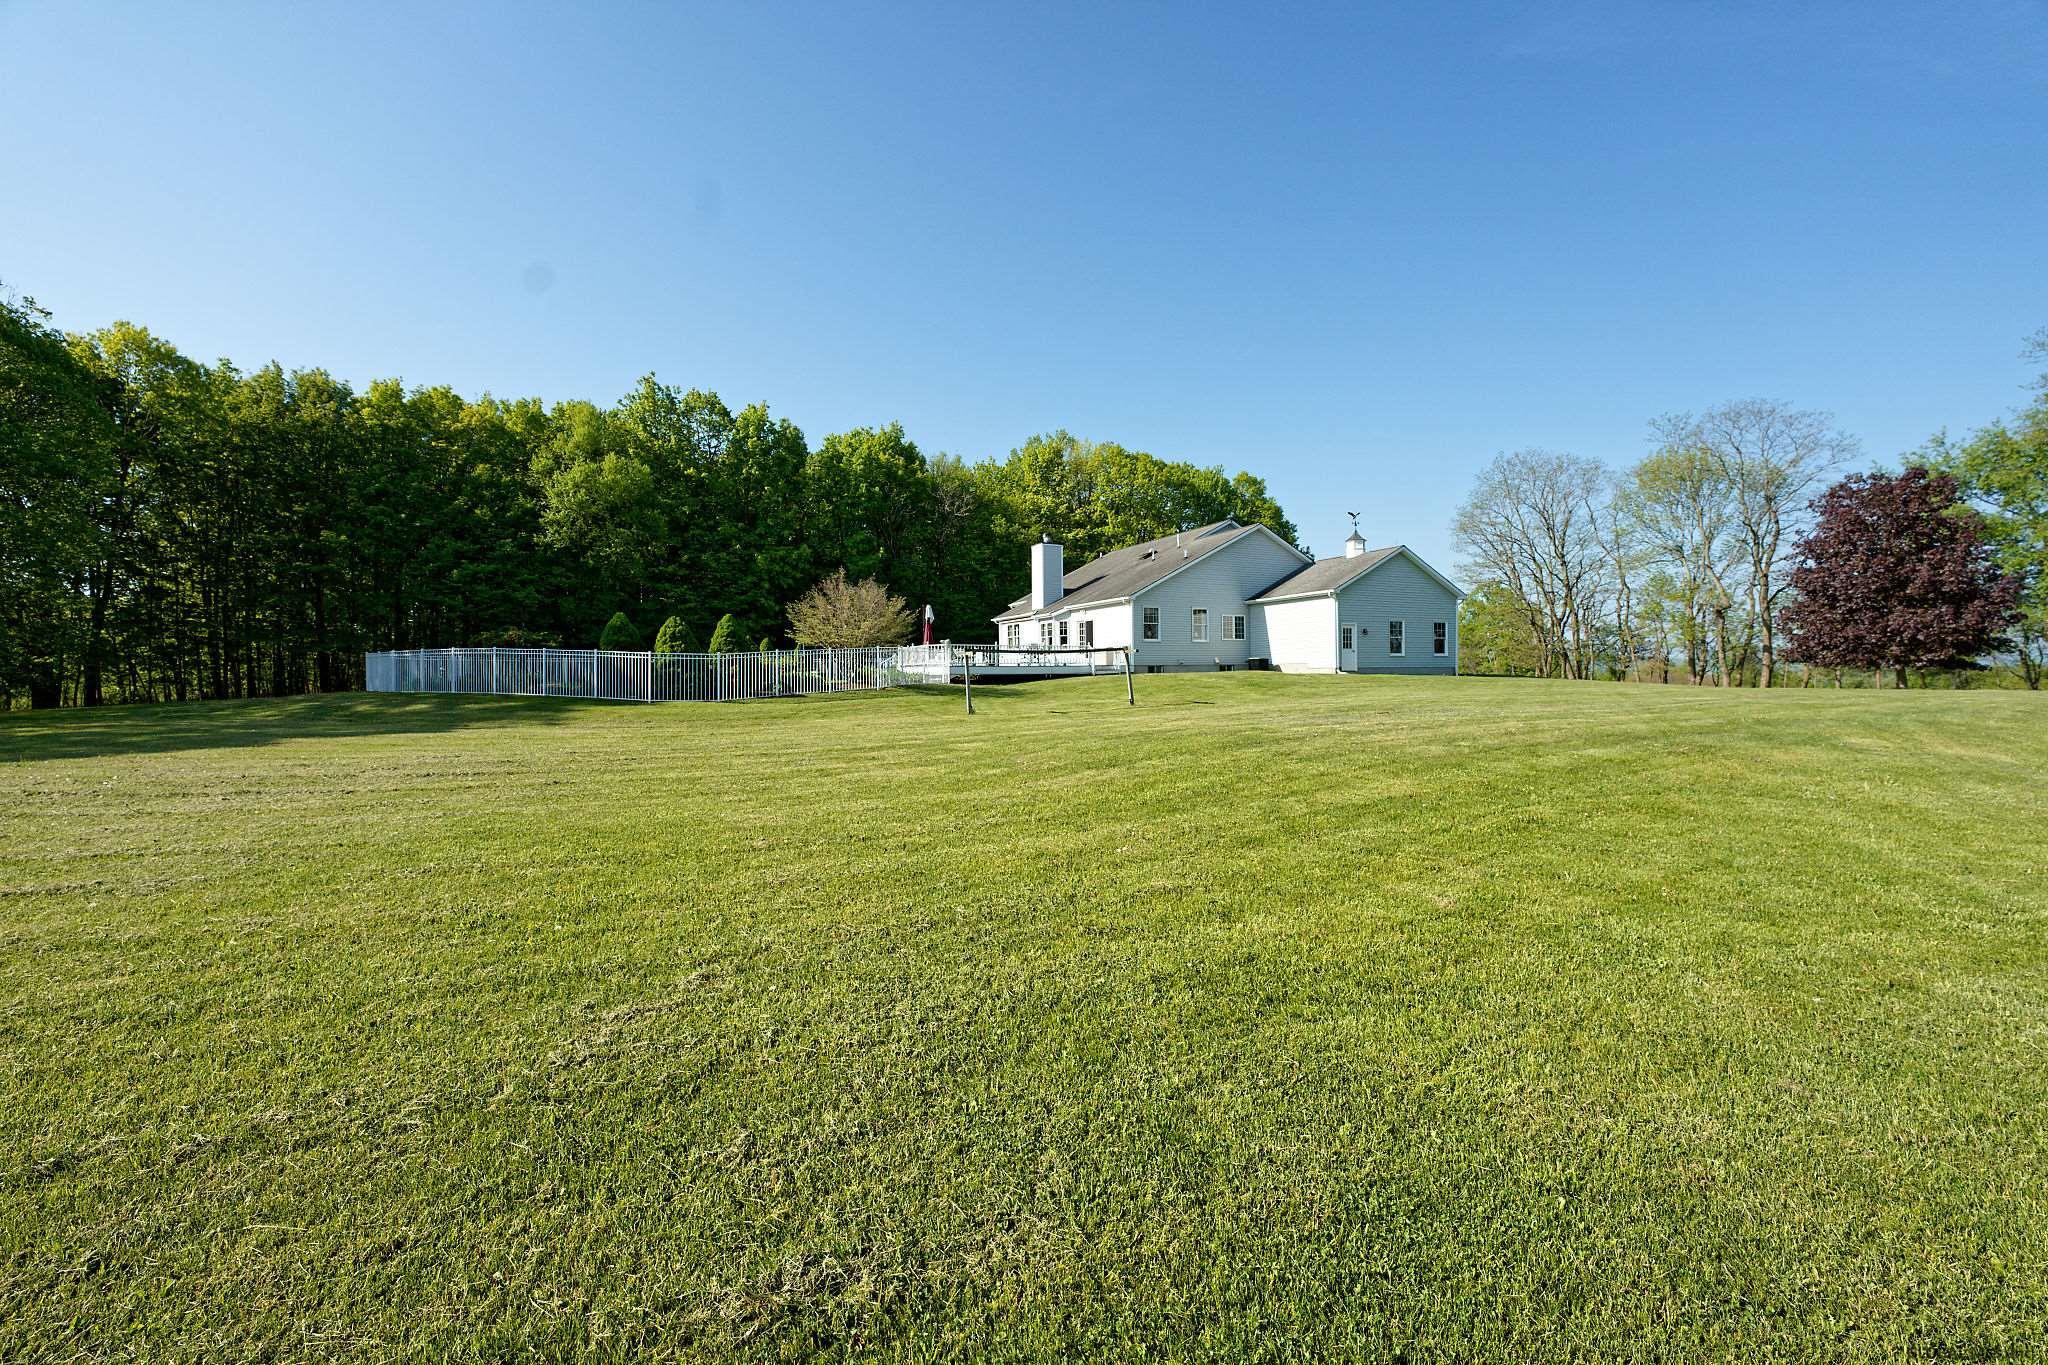 Glenville image 76